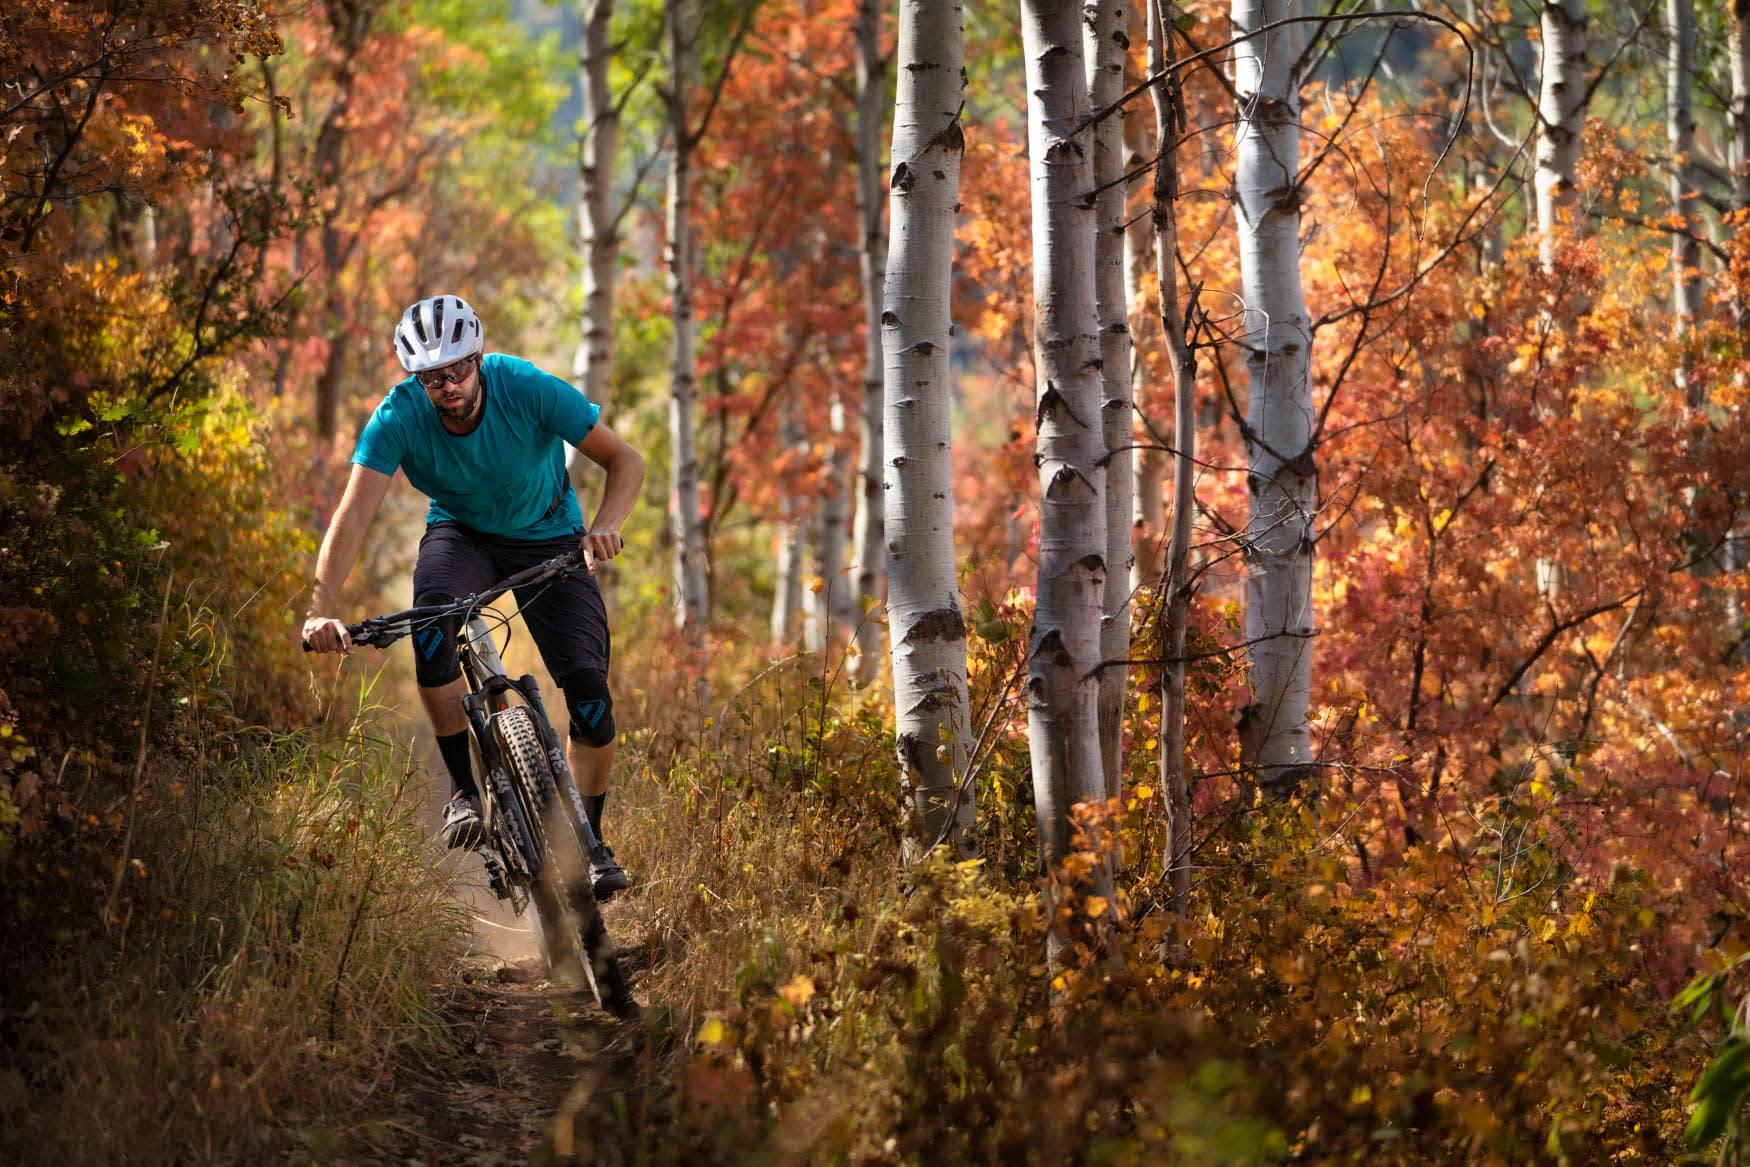 Fall in love biking in the outdoors!